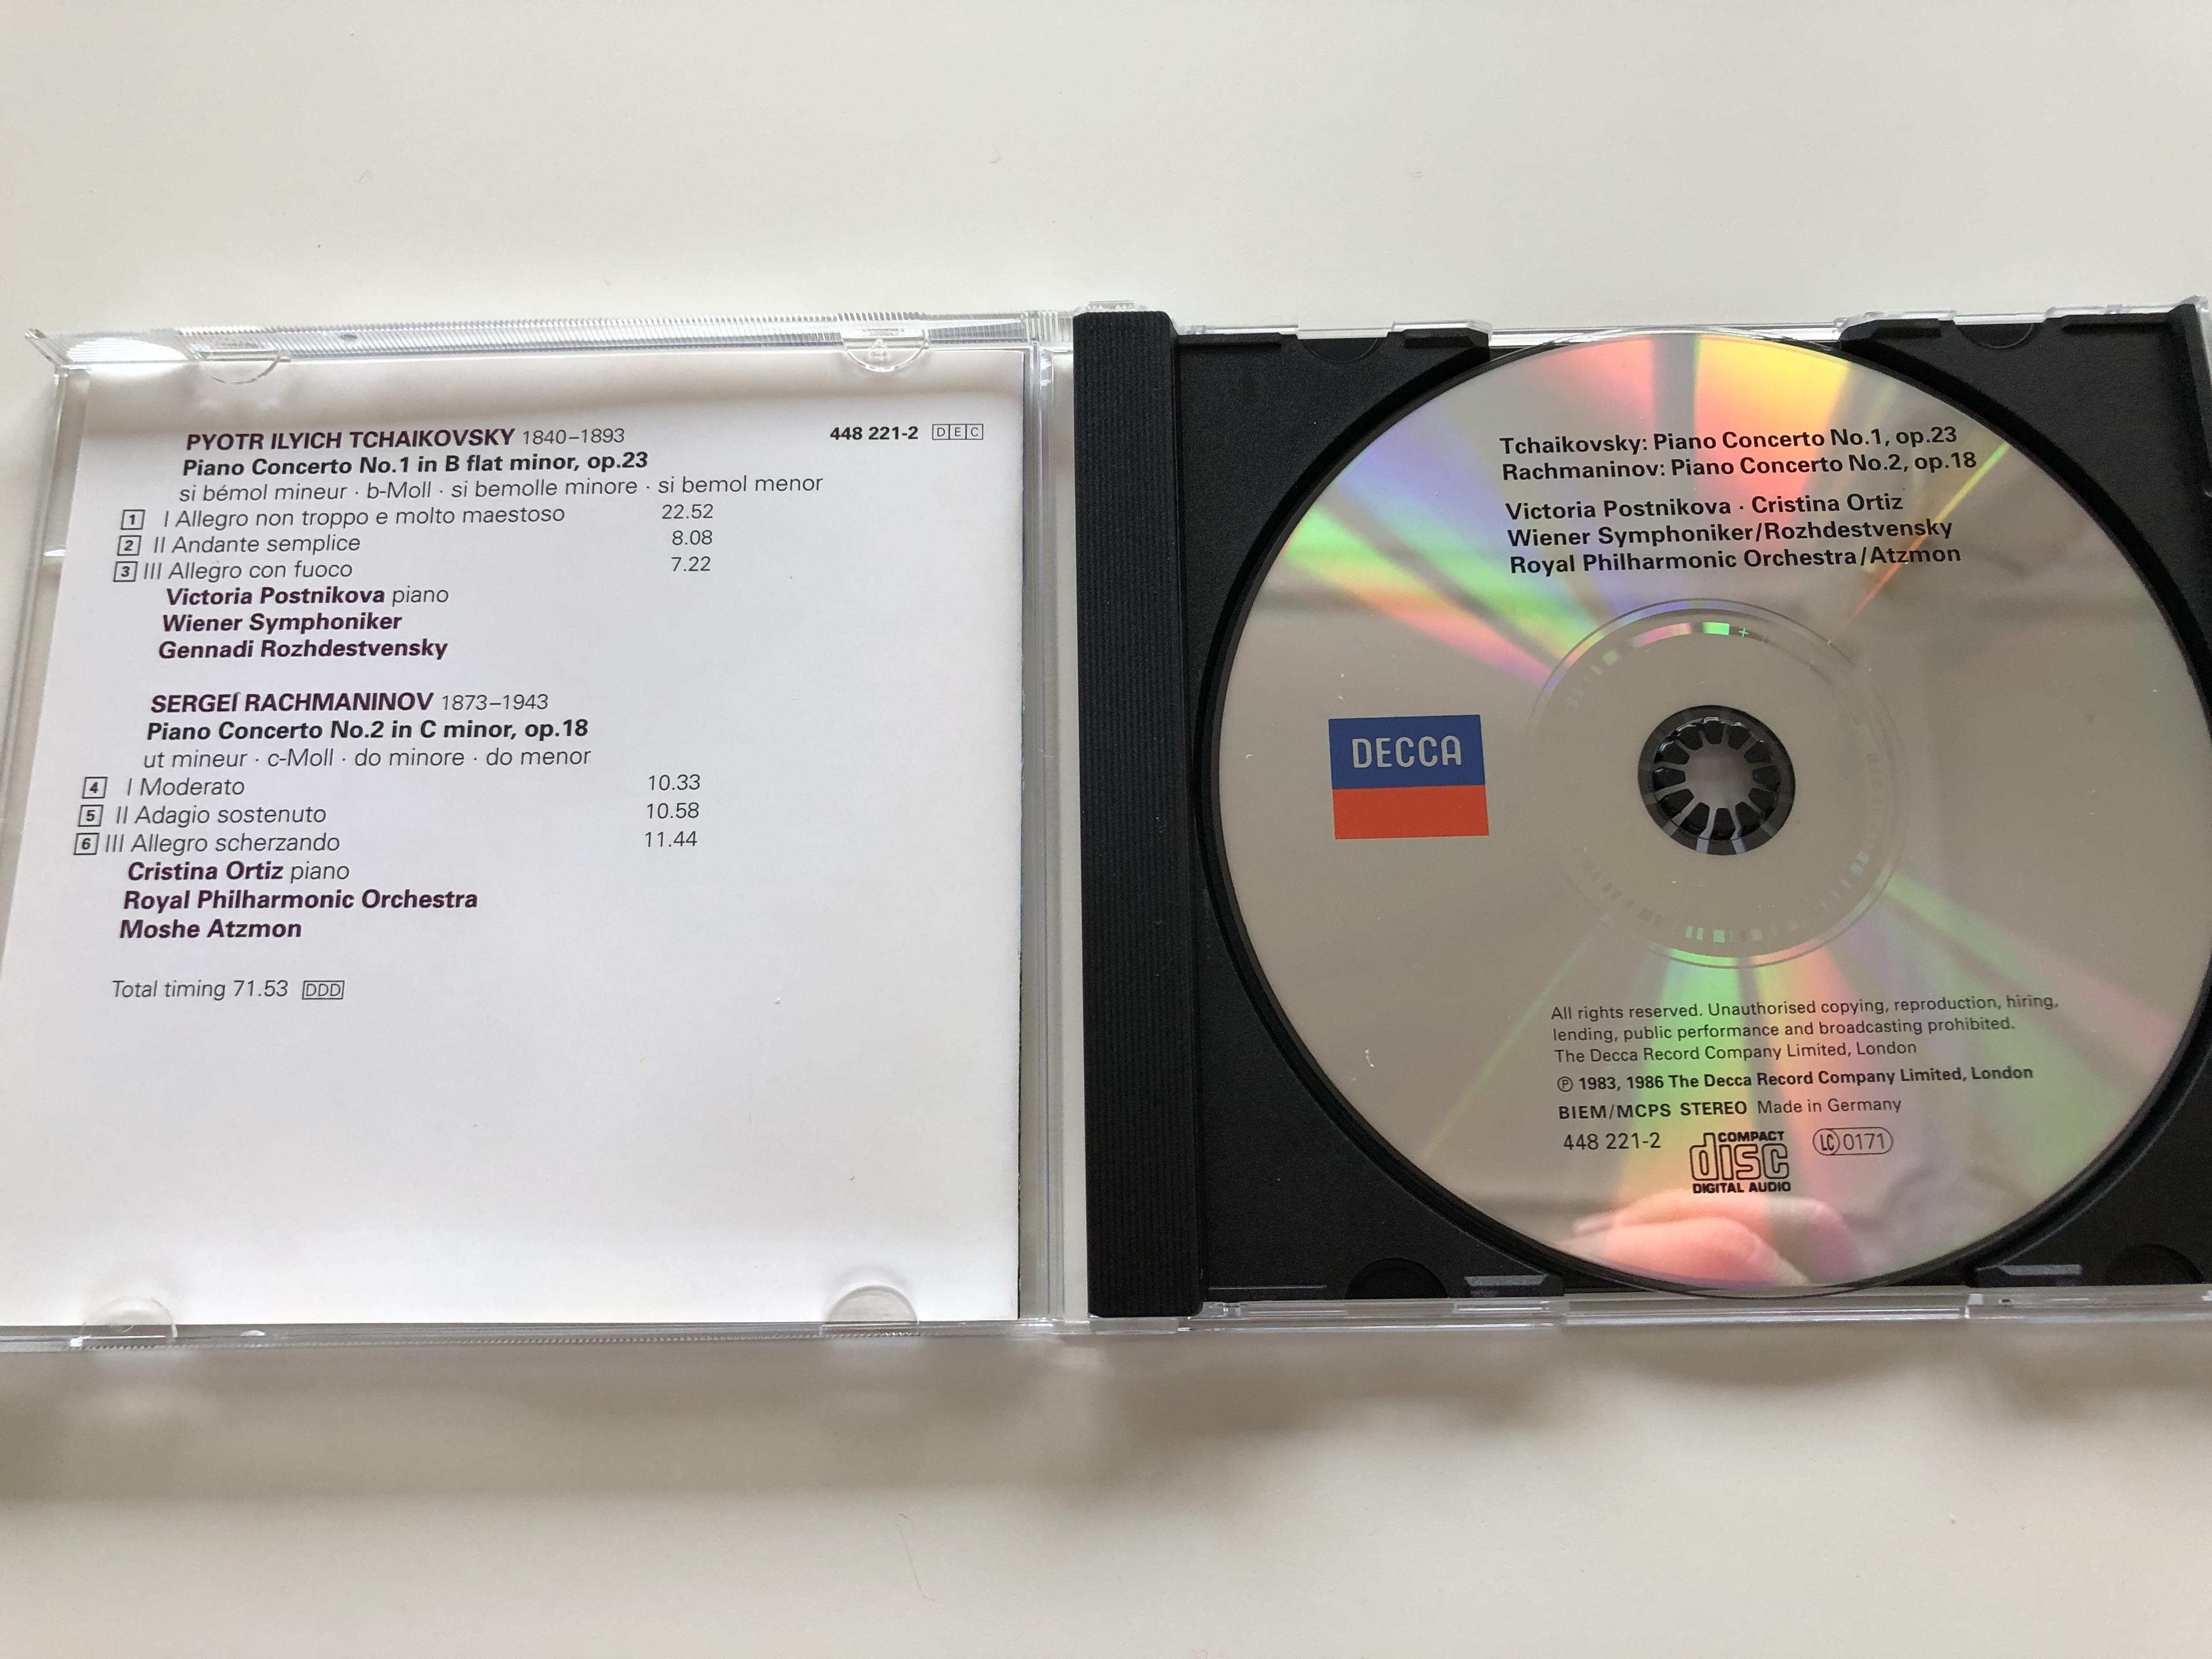 tchaikovsky-piano-concertoimg-2494.jpg